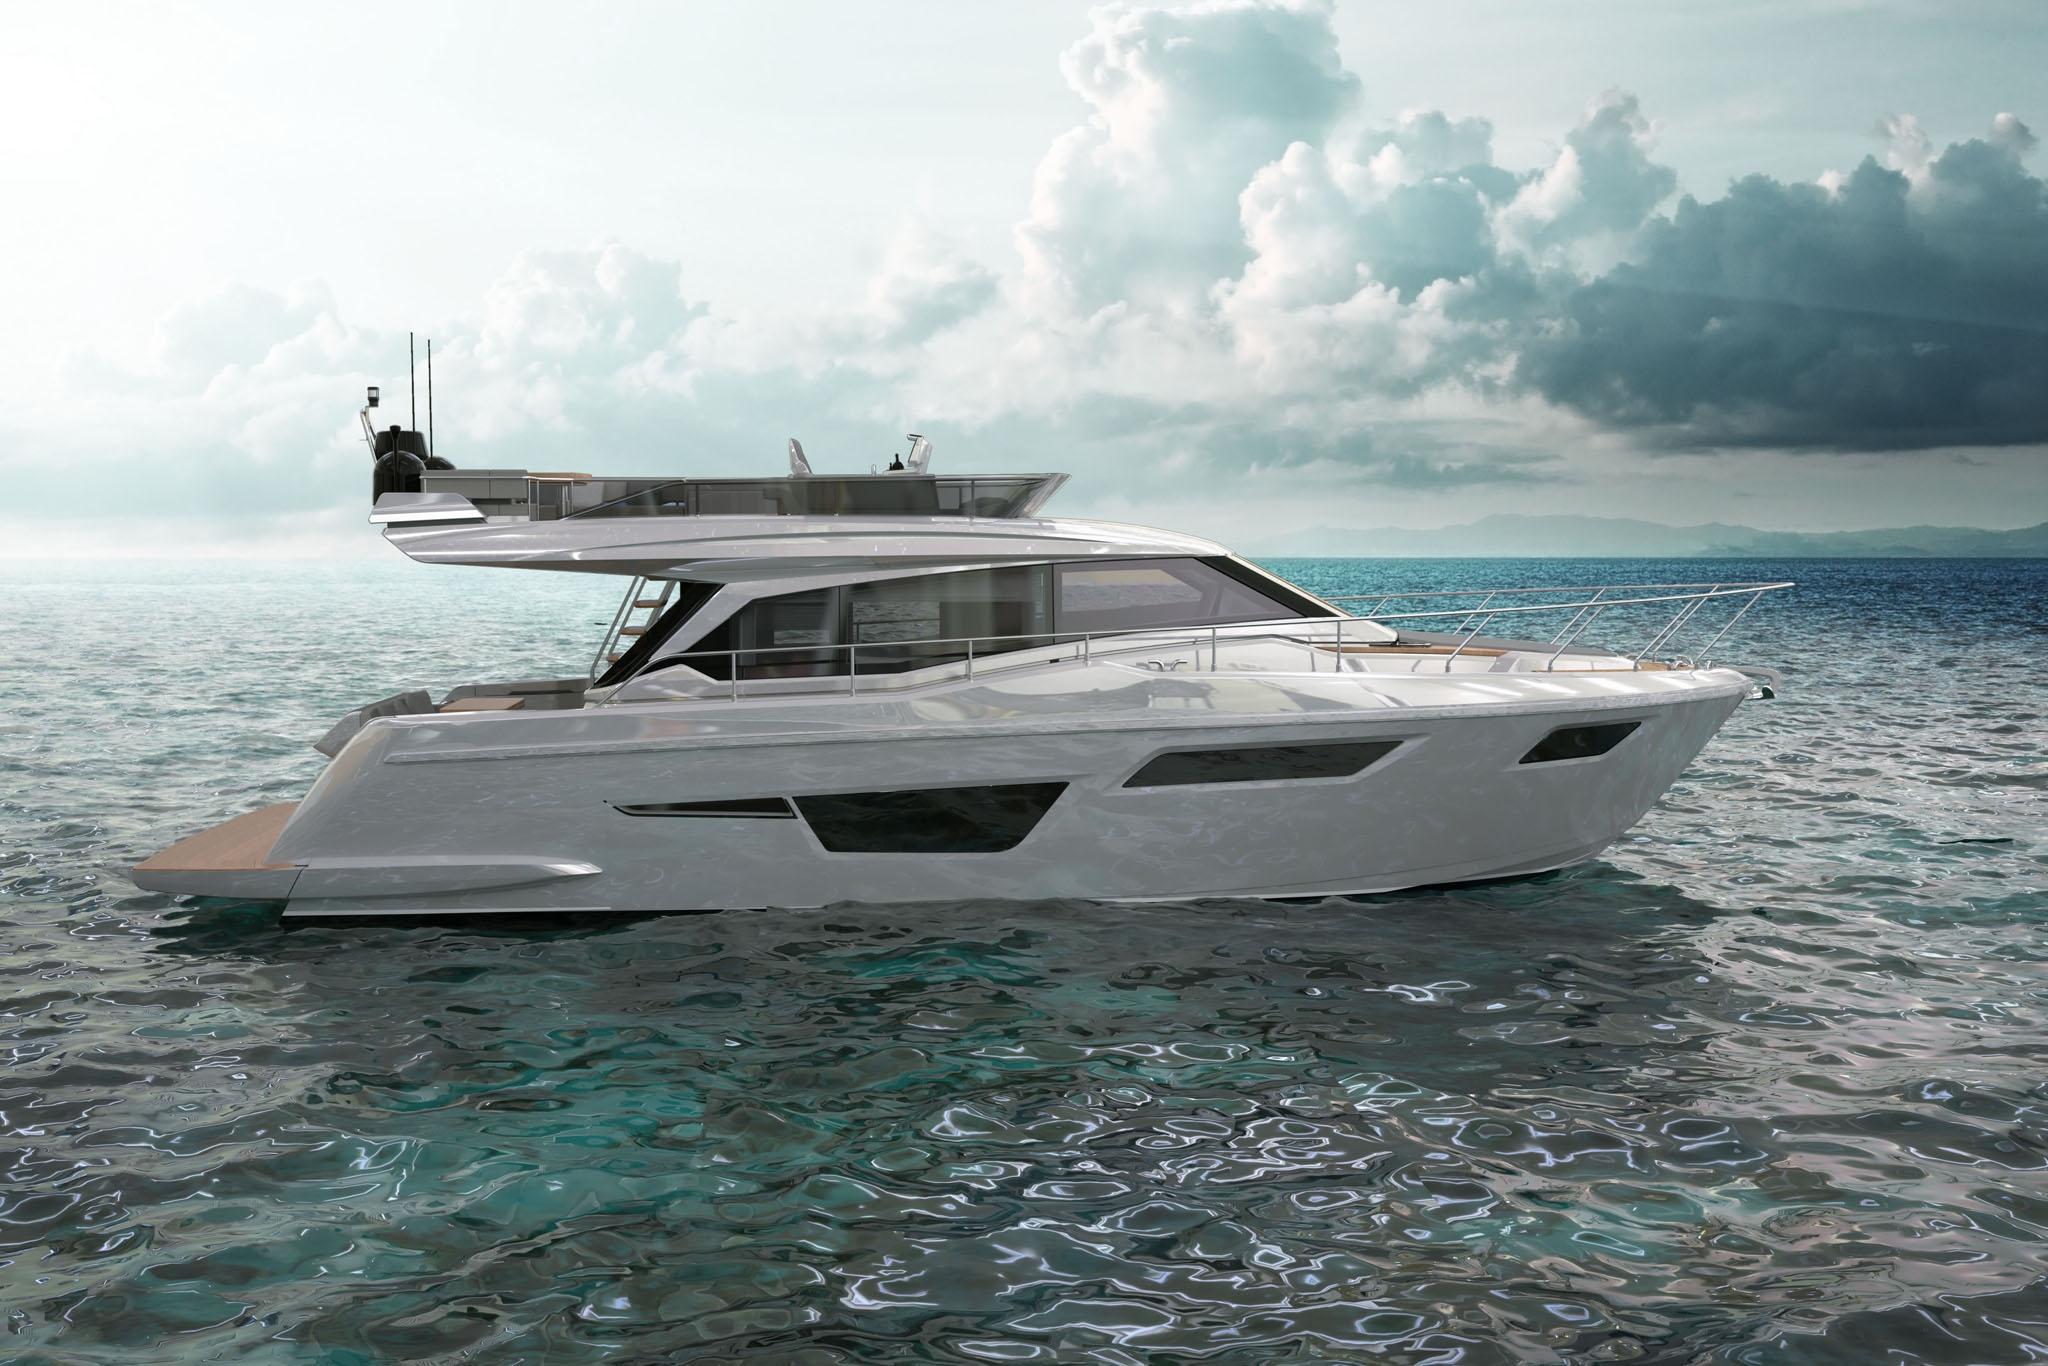 ferretti-yachts-500-jma-yachting